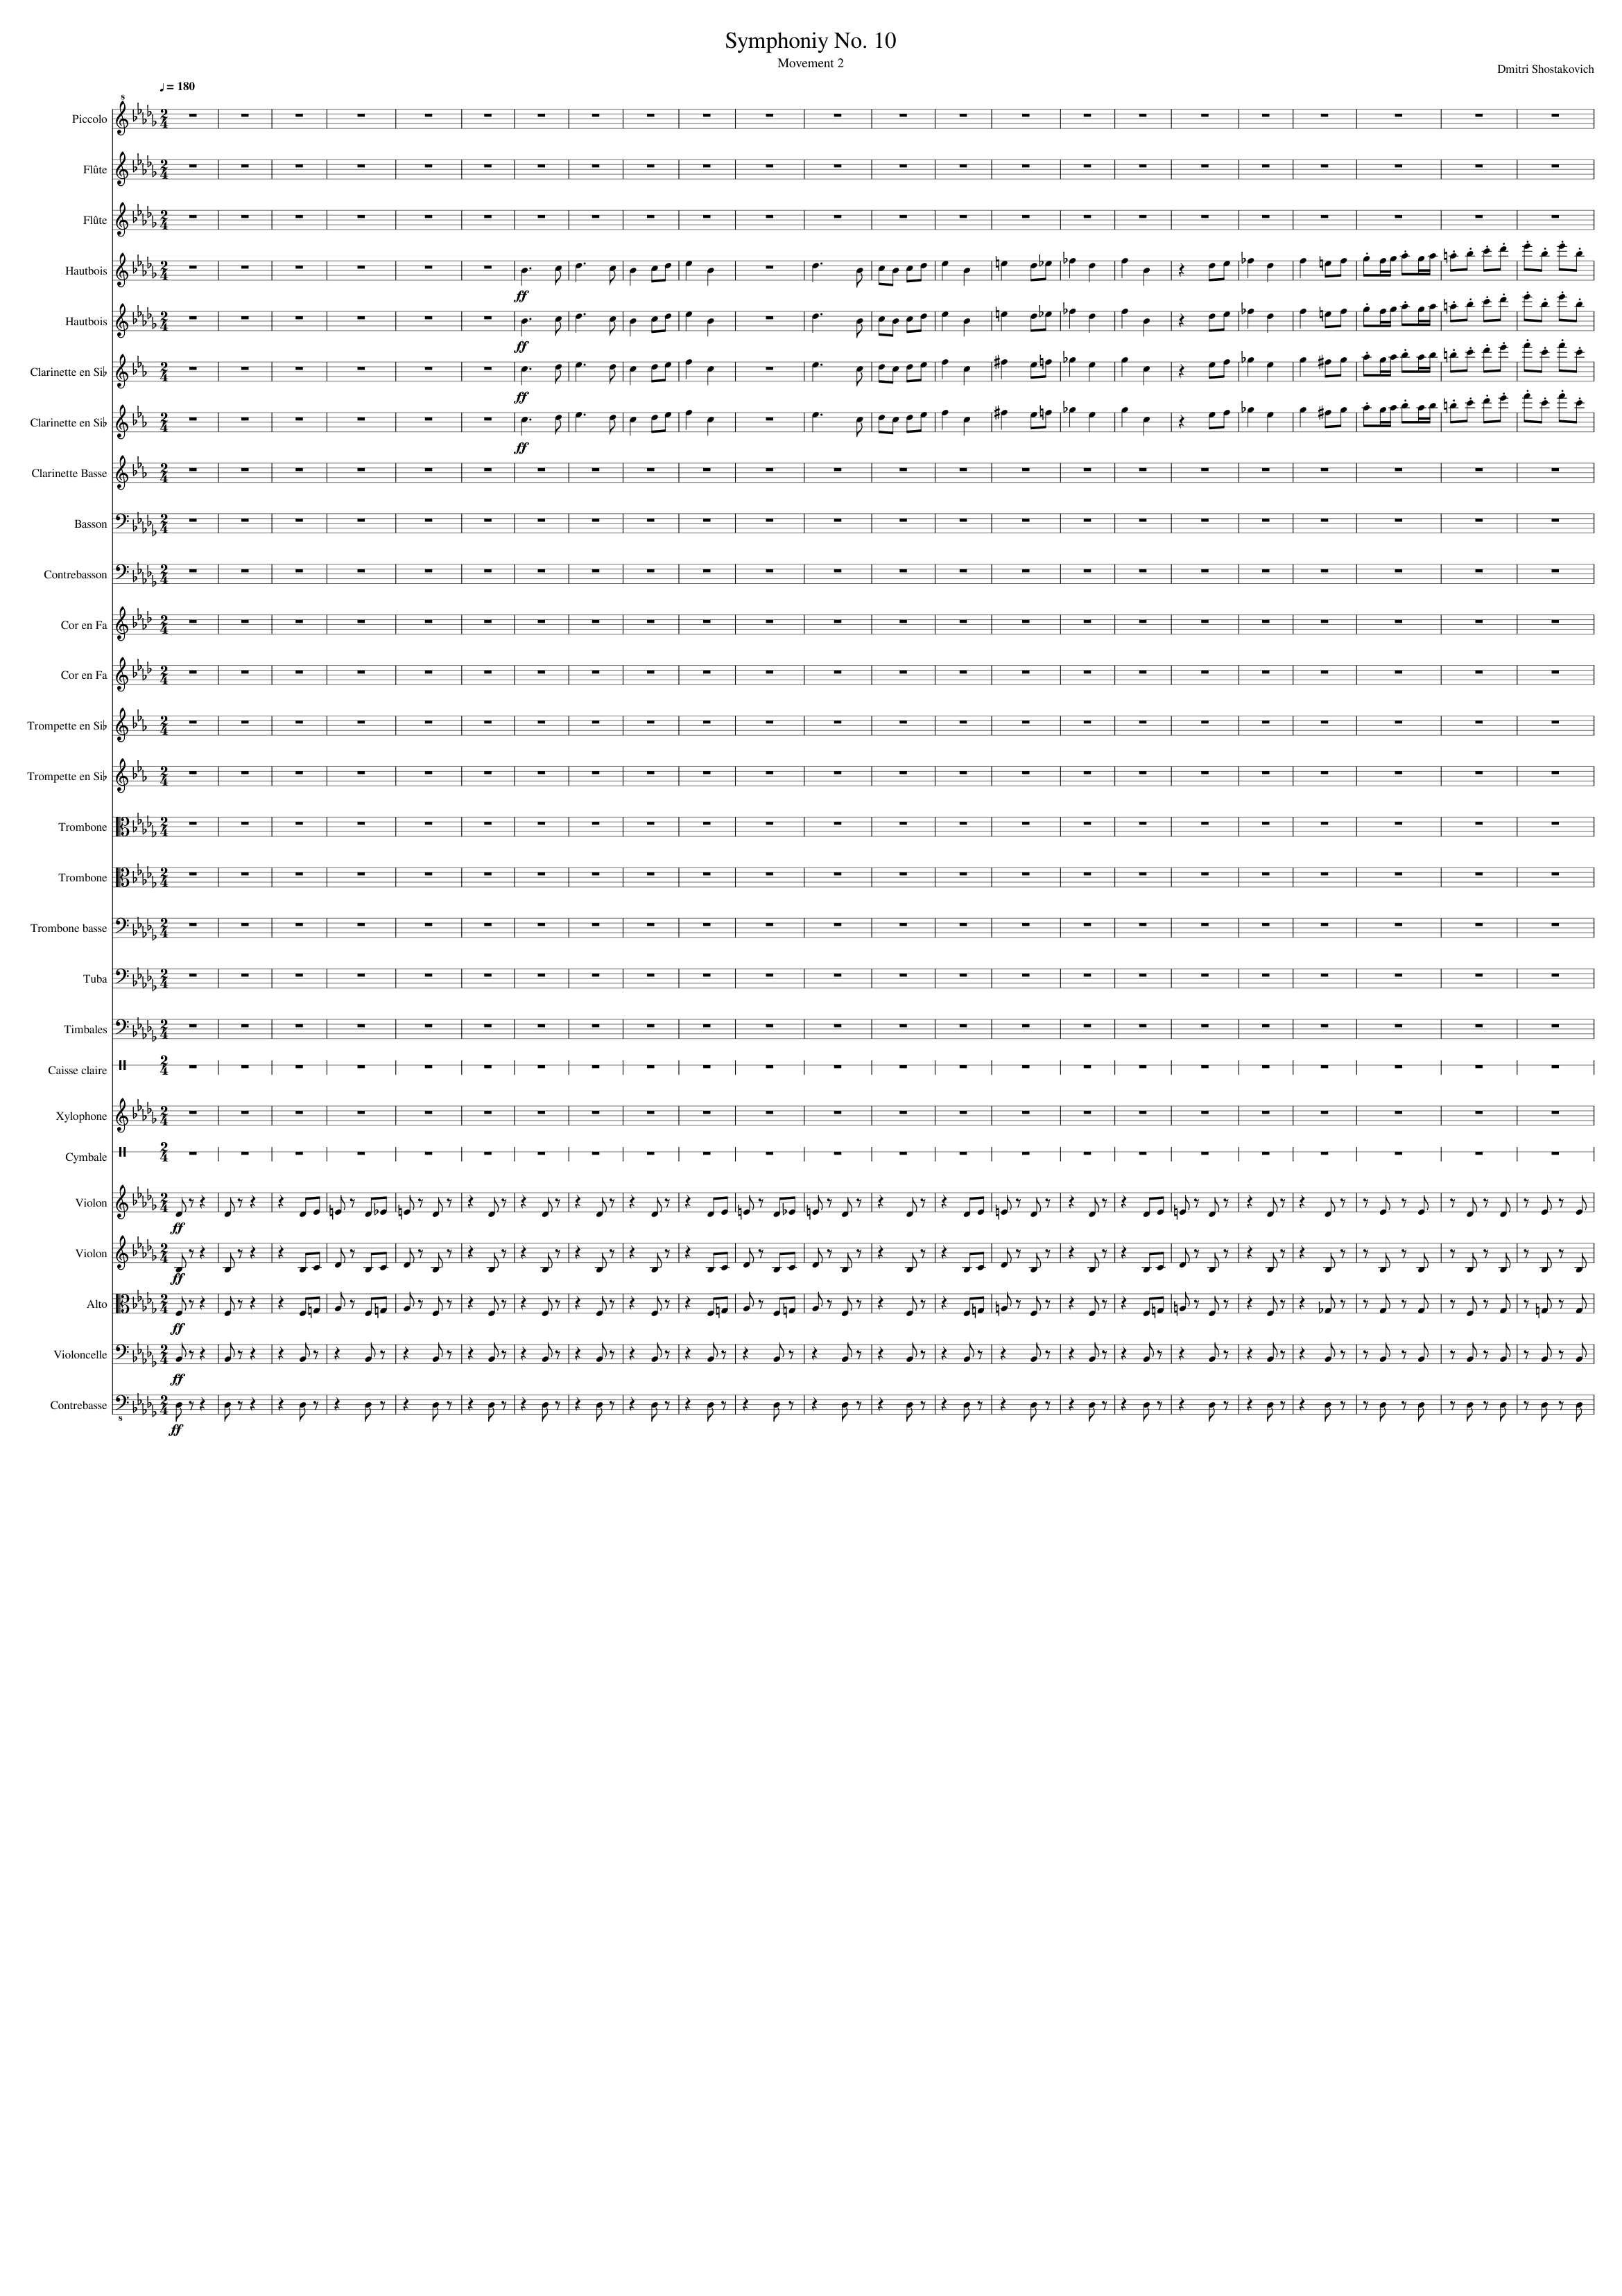 Symphonie No  10, mouvement 2 (Dmitri Shostakovich) sheet music for